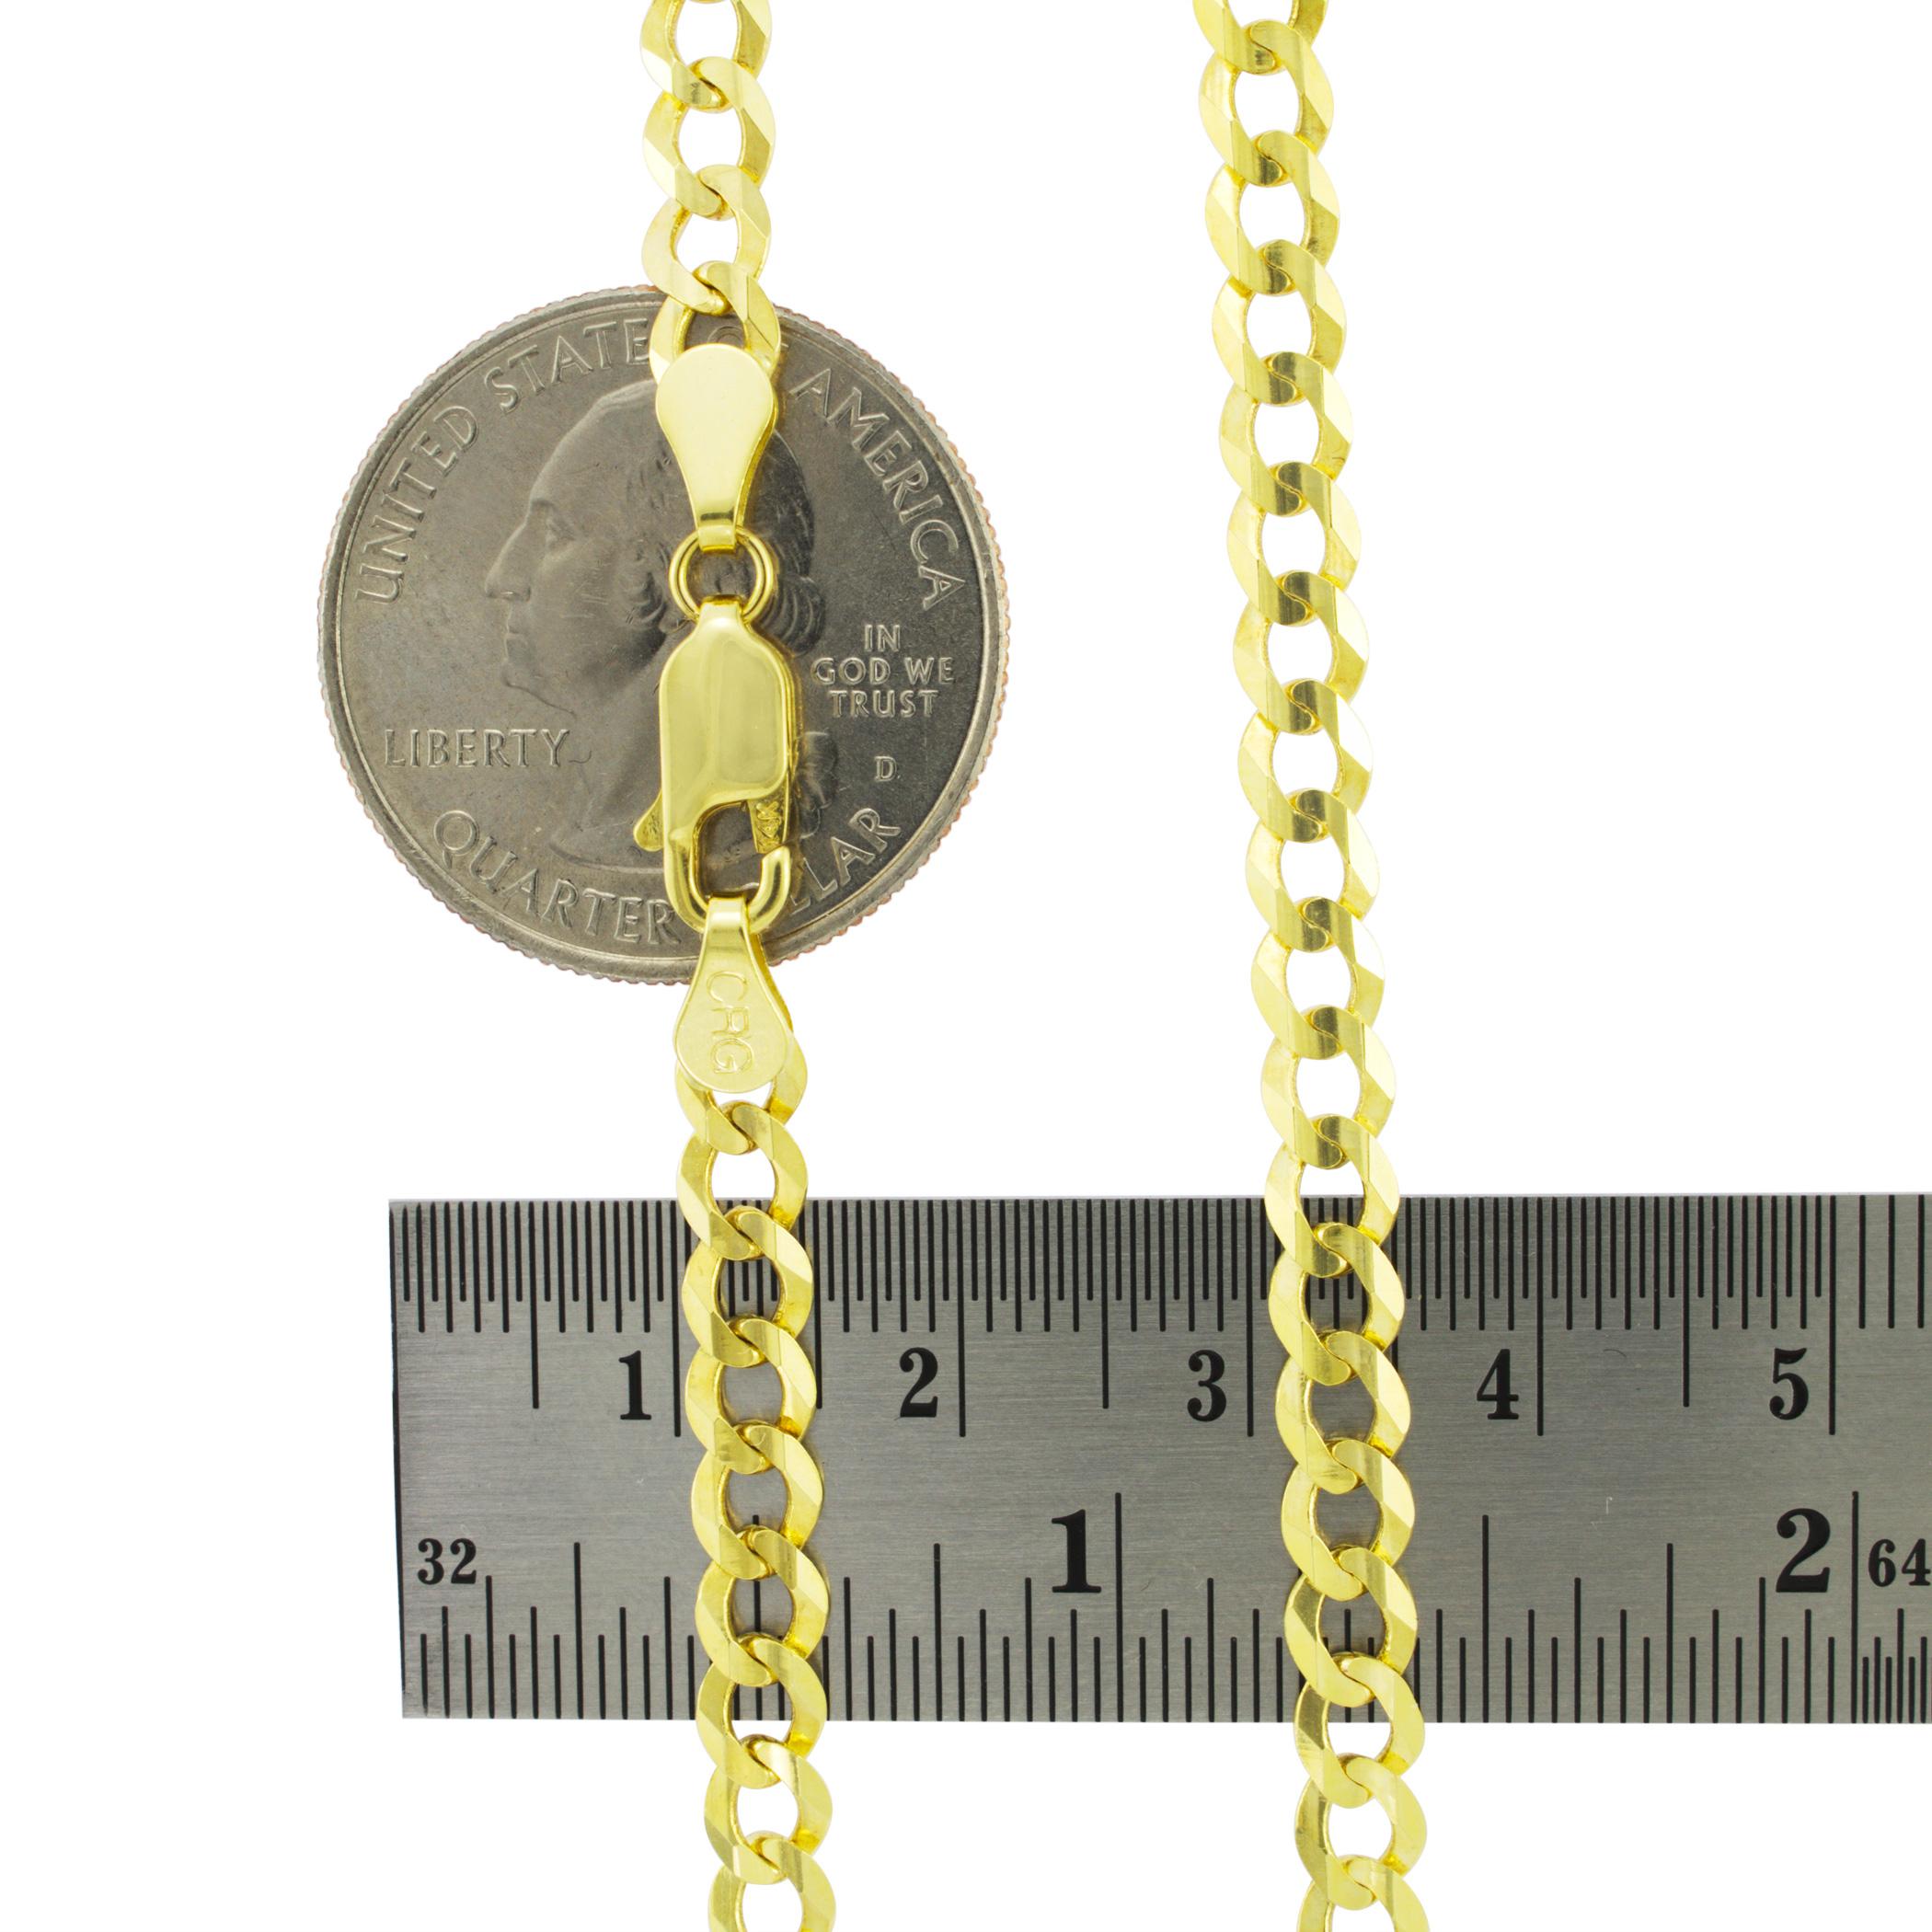 Solid-14K-Yellow-Gold-2-5mm-12mm-Cuban-Curb-Chain-Link-Bracelet-Men-Women-7-034-9-034 thumbnail 20